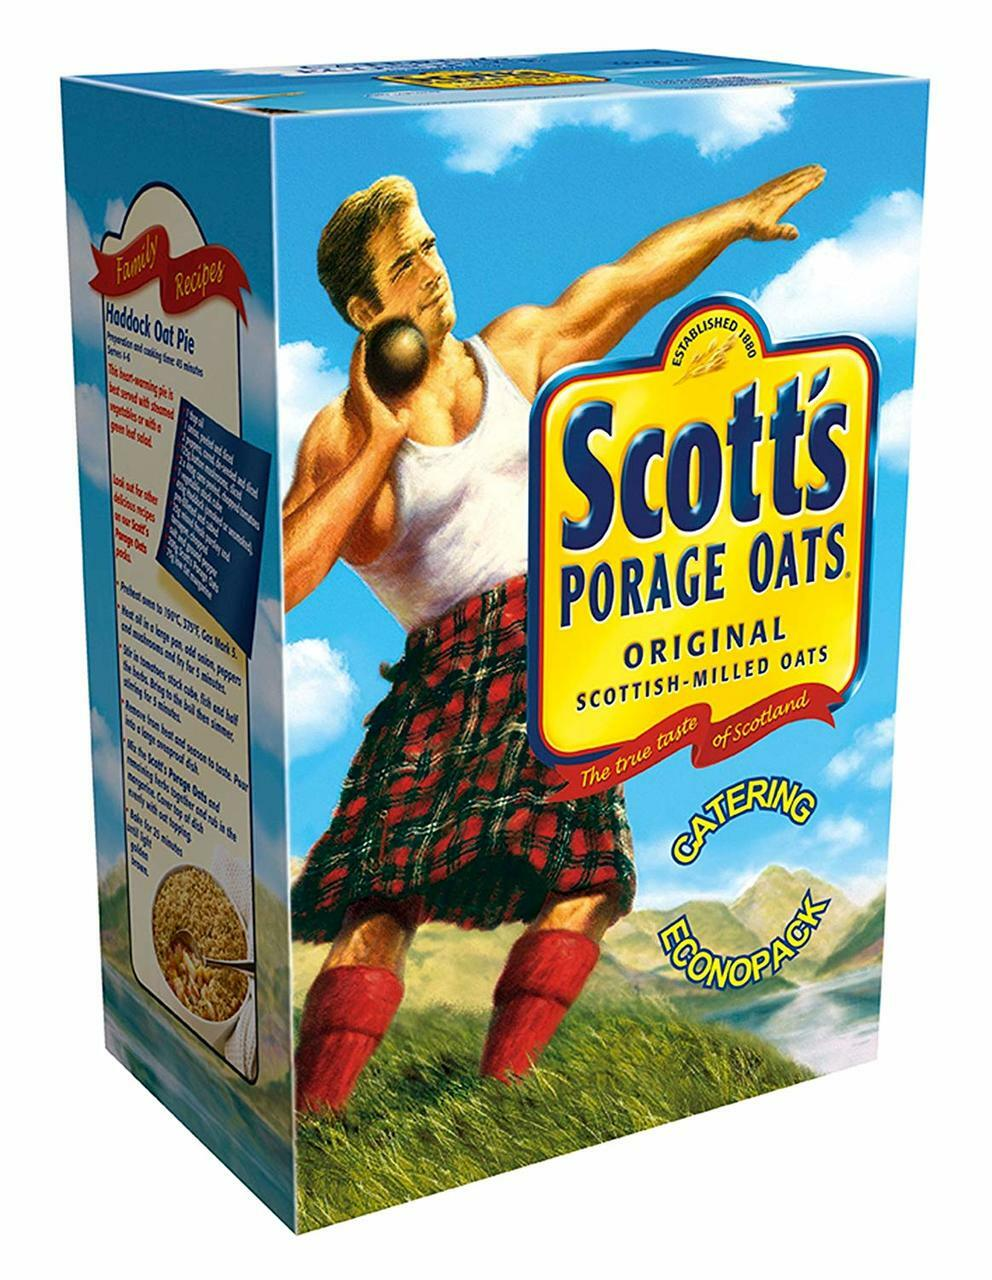 Scott's Porridge Oats 3kg box